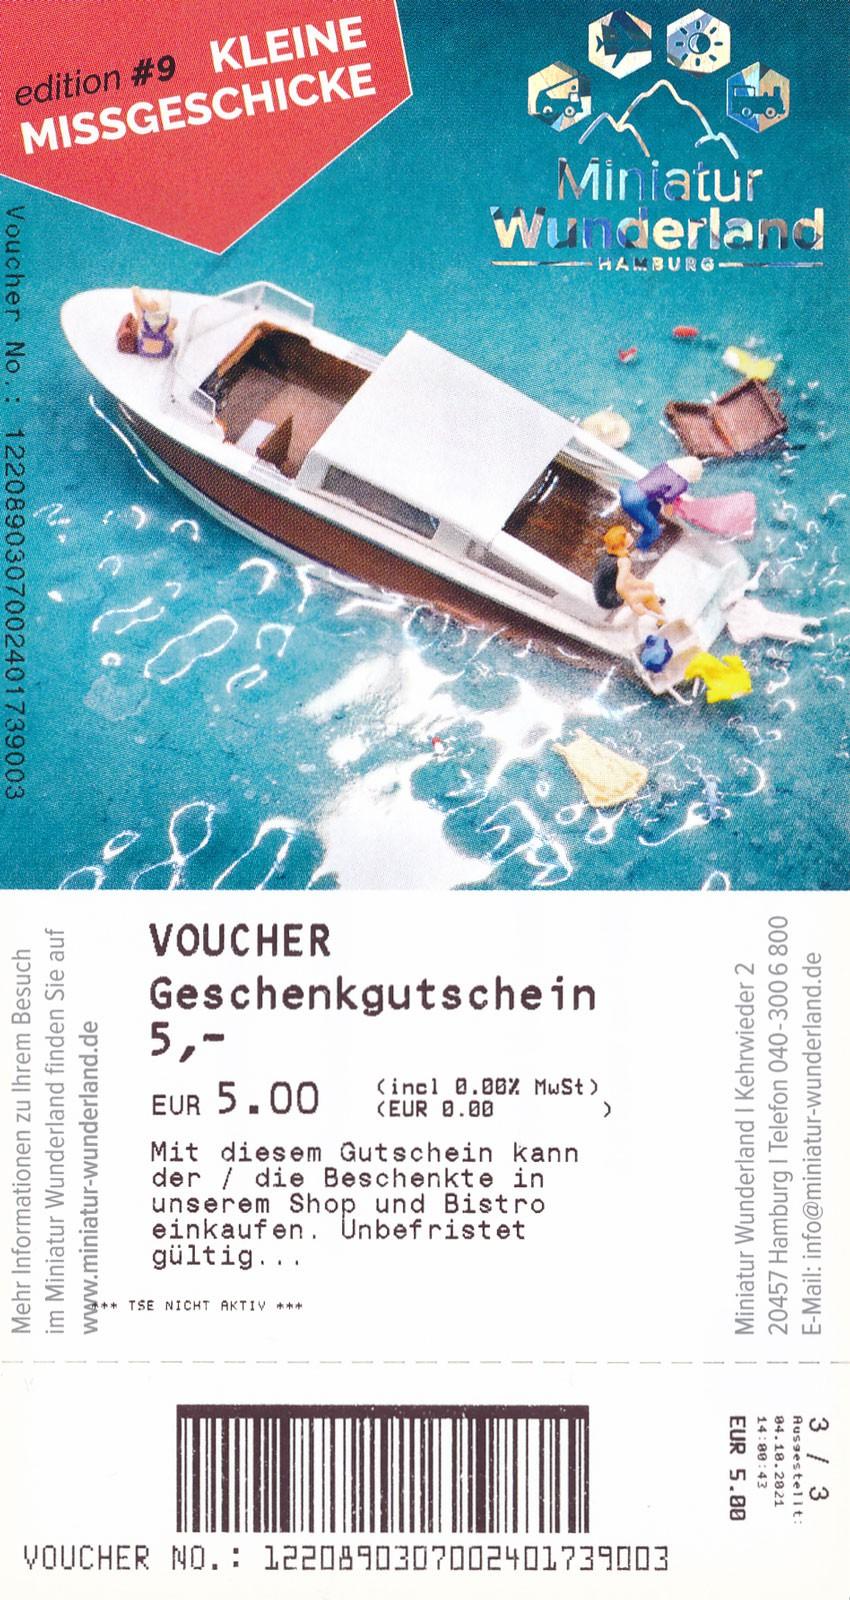 5 € Gift Voucher for Shop or Bistro